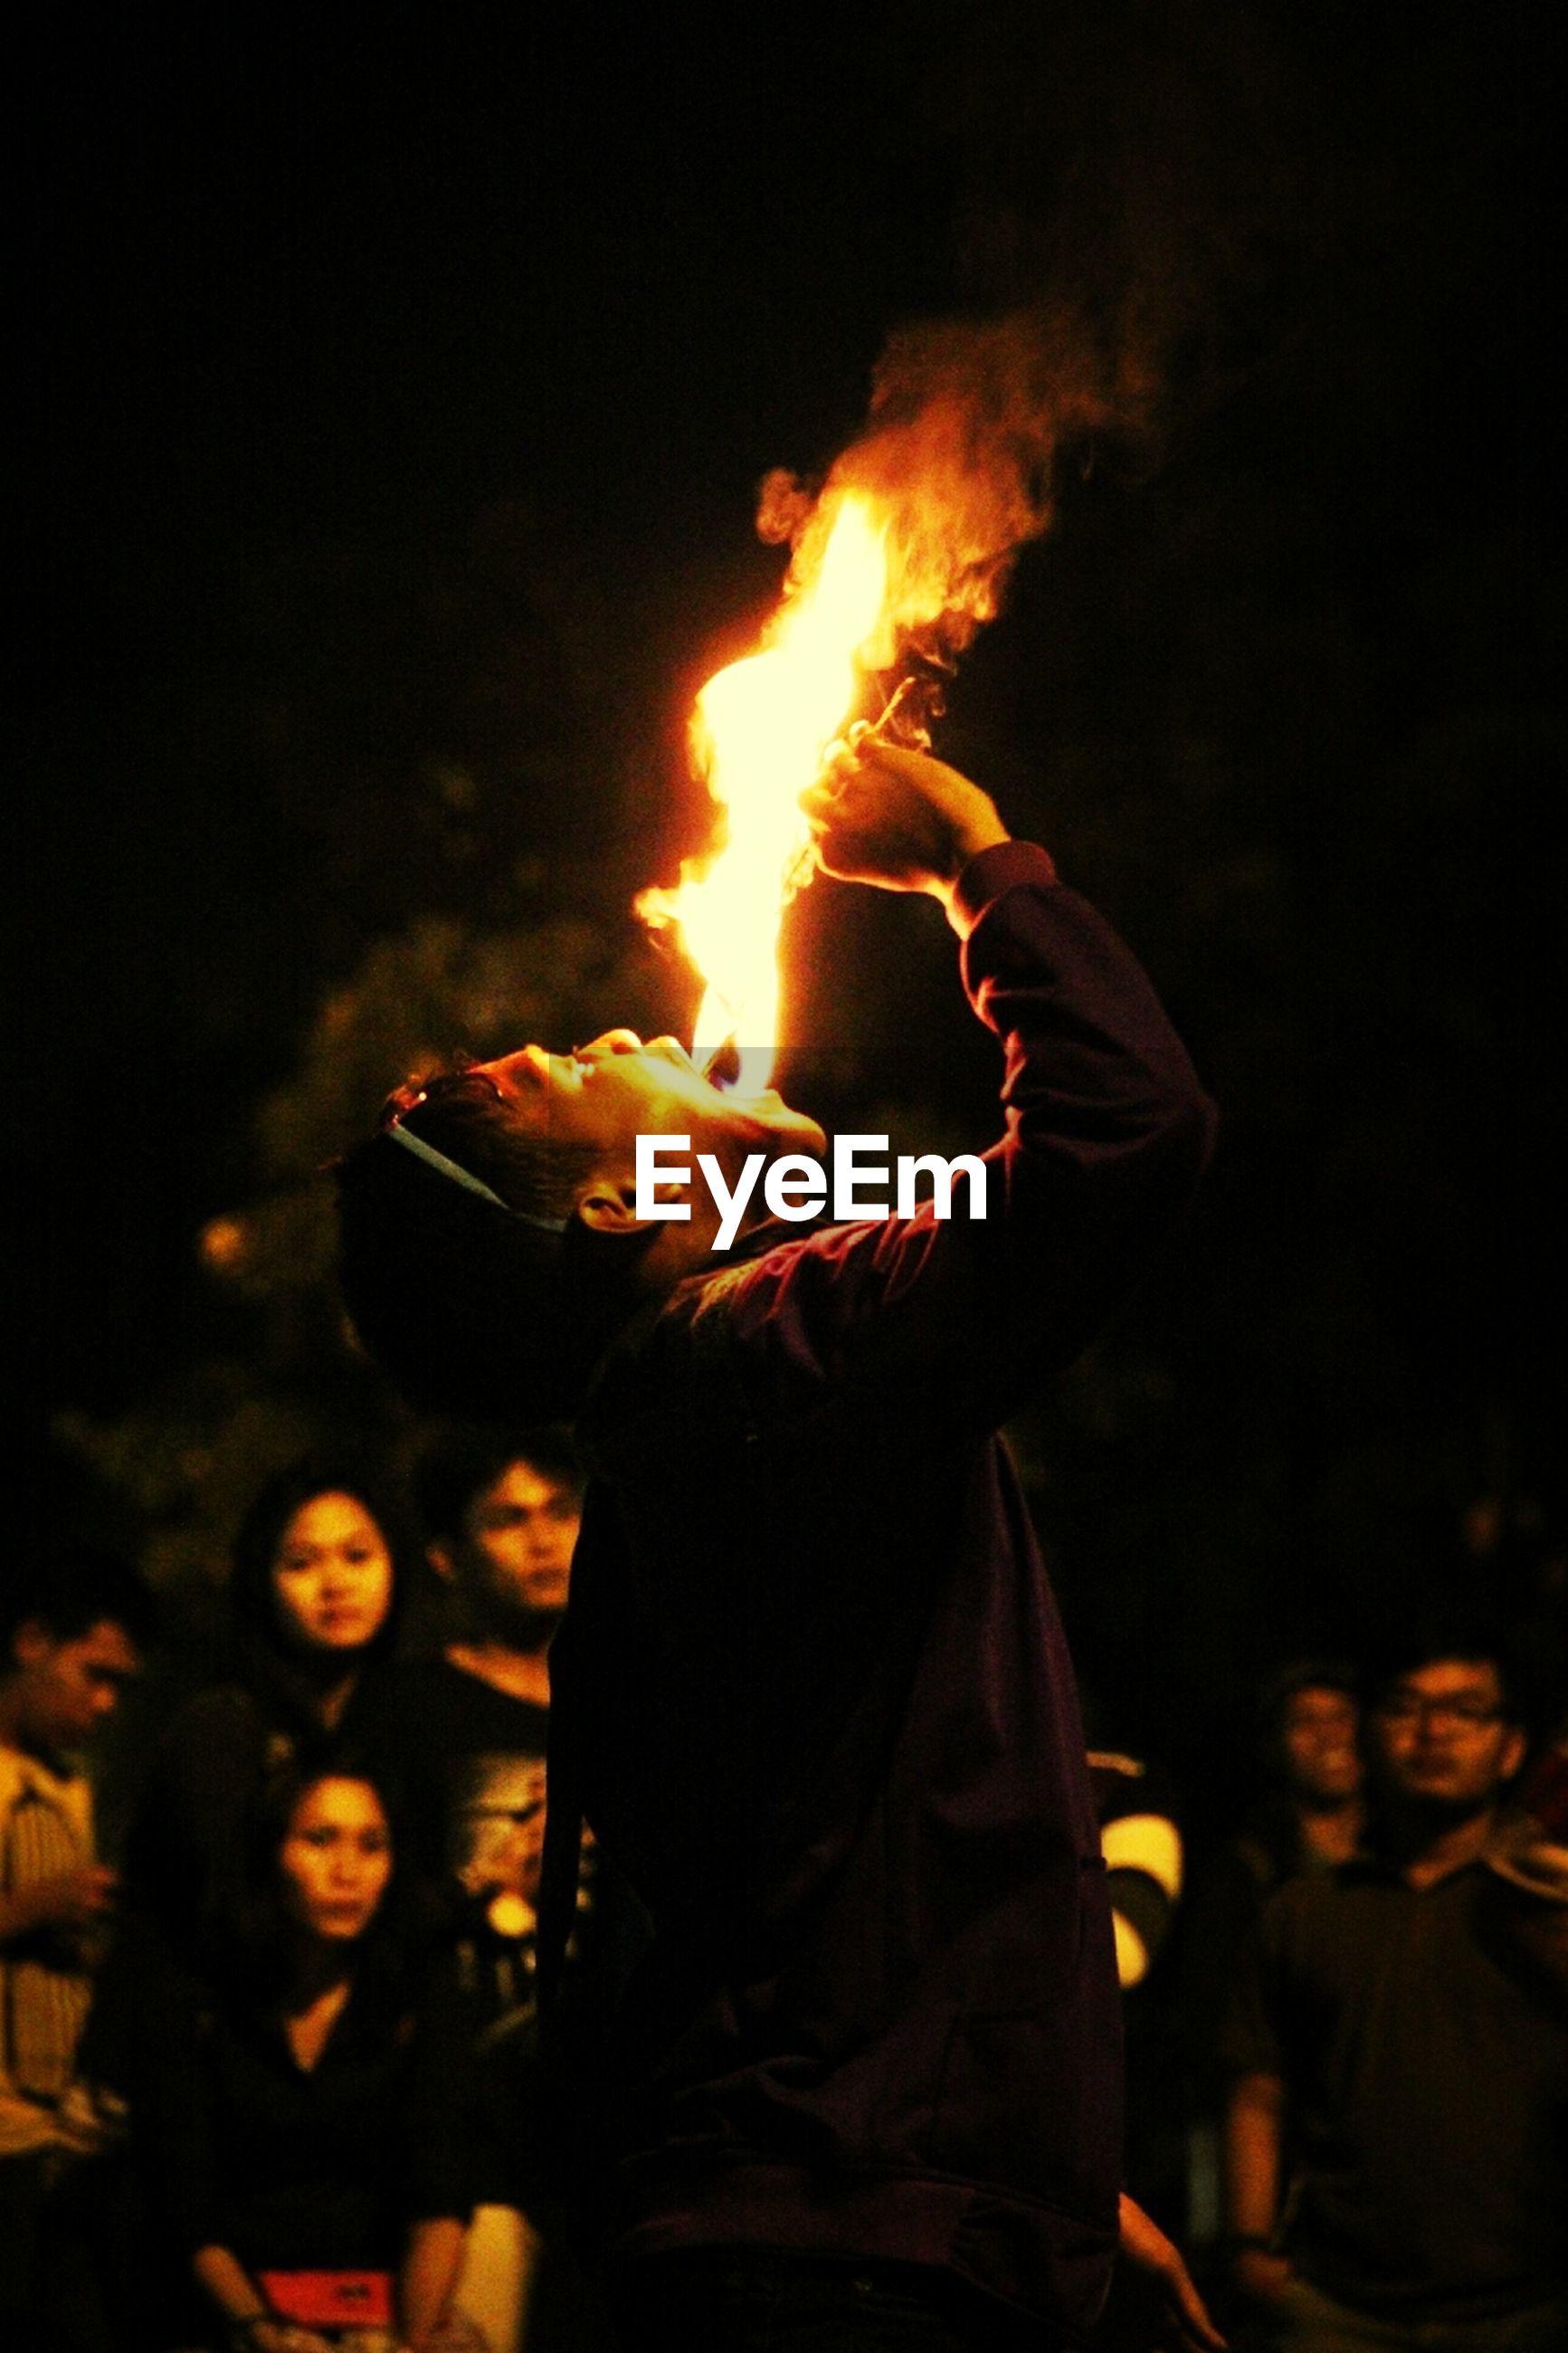 burning, flame, fire - natural phenomenon, night, heat - temperature, bonfire, glowing, fire, orange color, men, leisure activity, lifestyles, illuminated, heat, dark, campfire, outdoors, standing